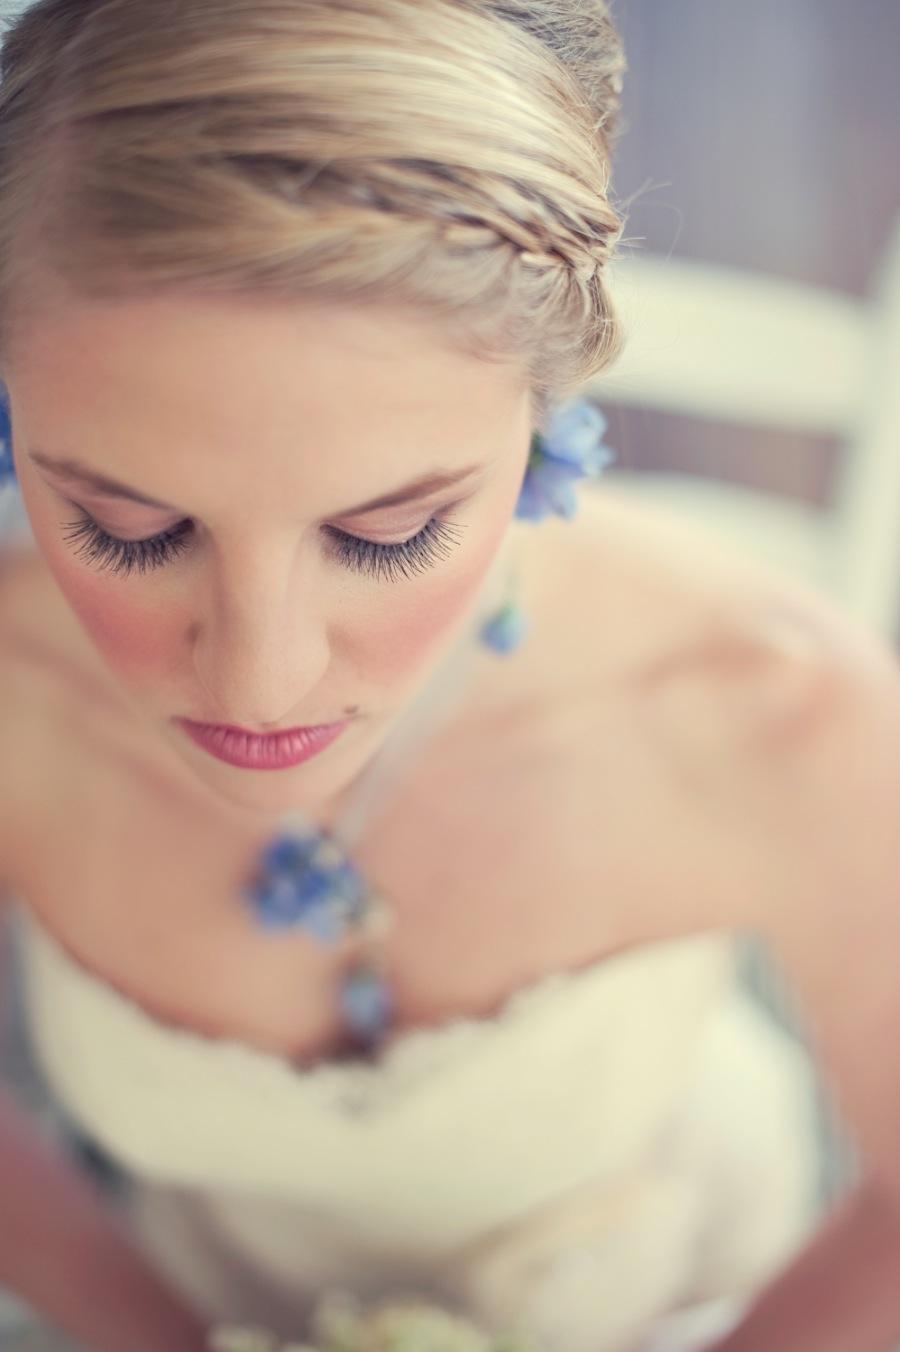 preppy_croquet_ocean_house_wedding_coral_blue_watch_hill_rhode_island_25